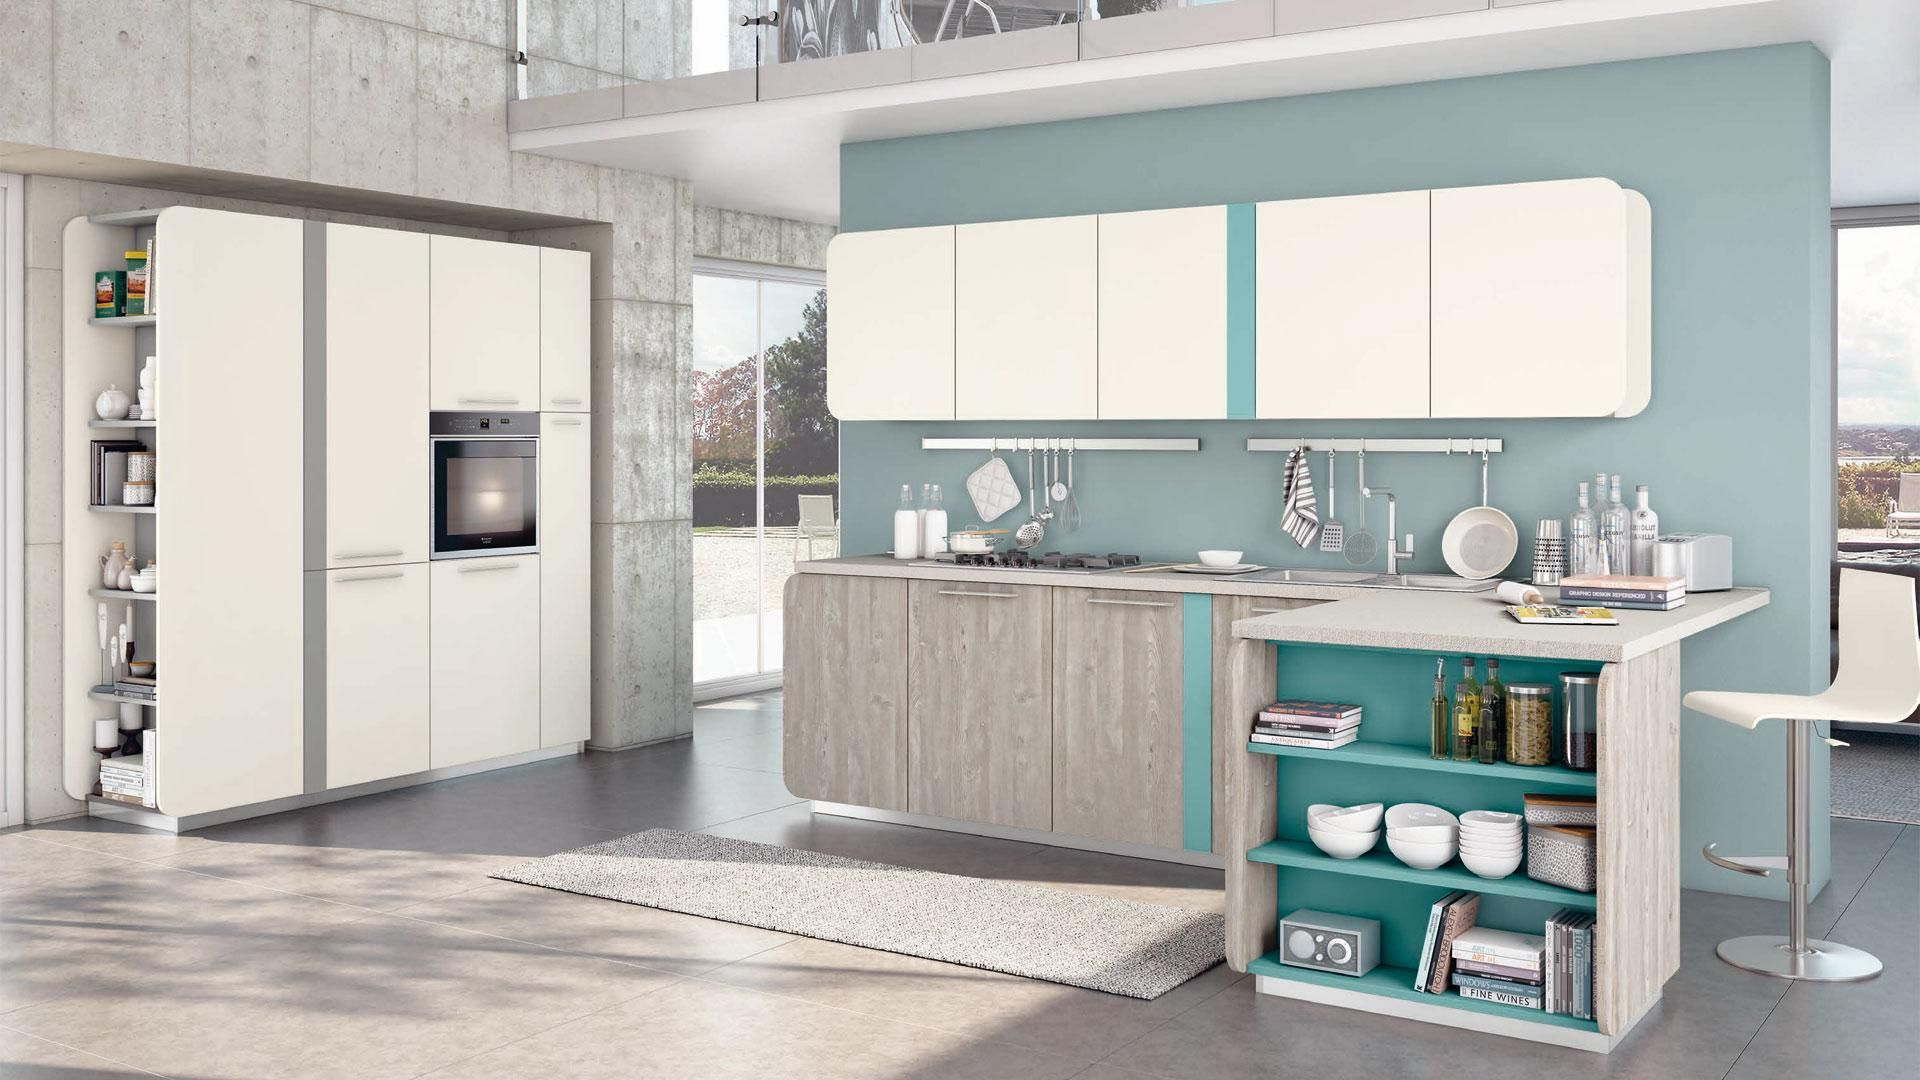 Immagina - Cucine Lube   Cucina   Pinterest